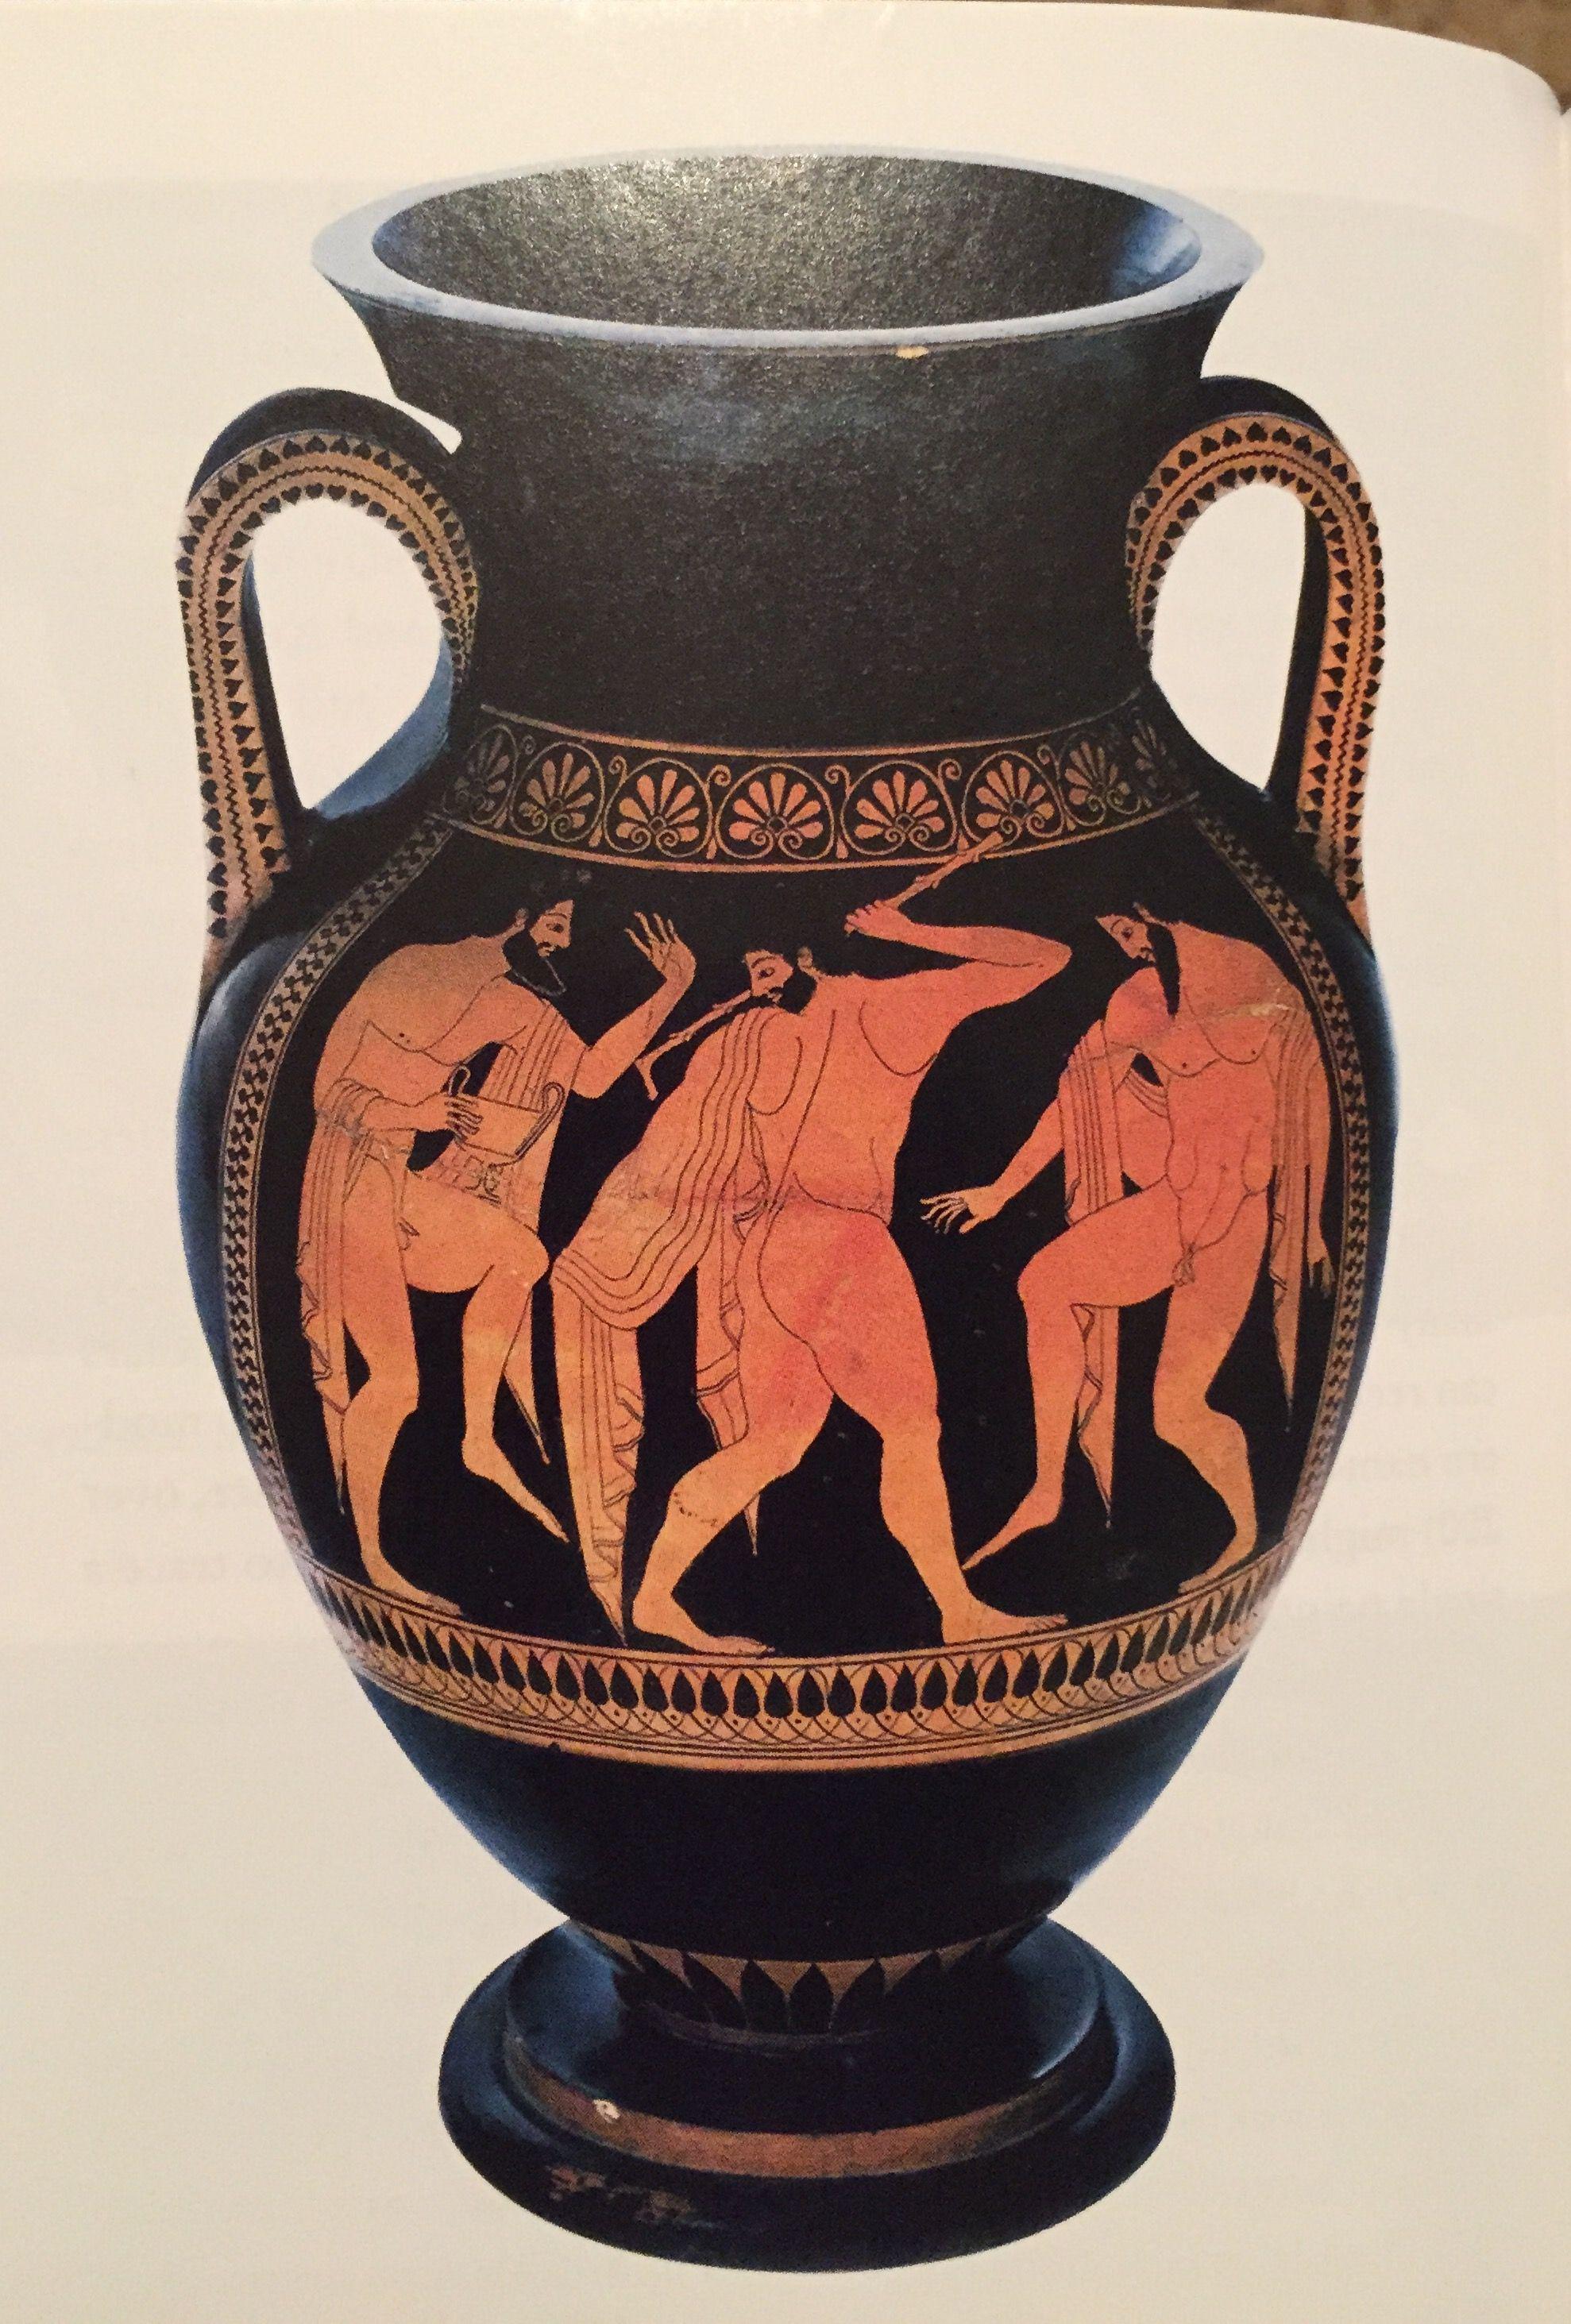 Euthymides dancing revelers c 510 500 archaicgreek art art history euthymides dancing revelers c 510 500 archaicgreek reviewsmspy